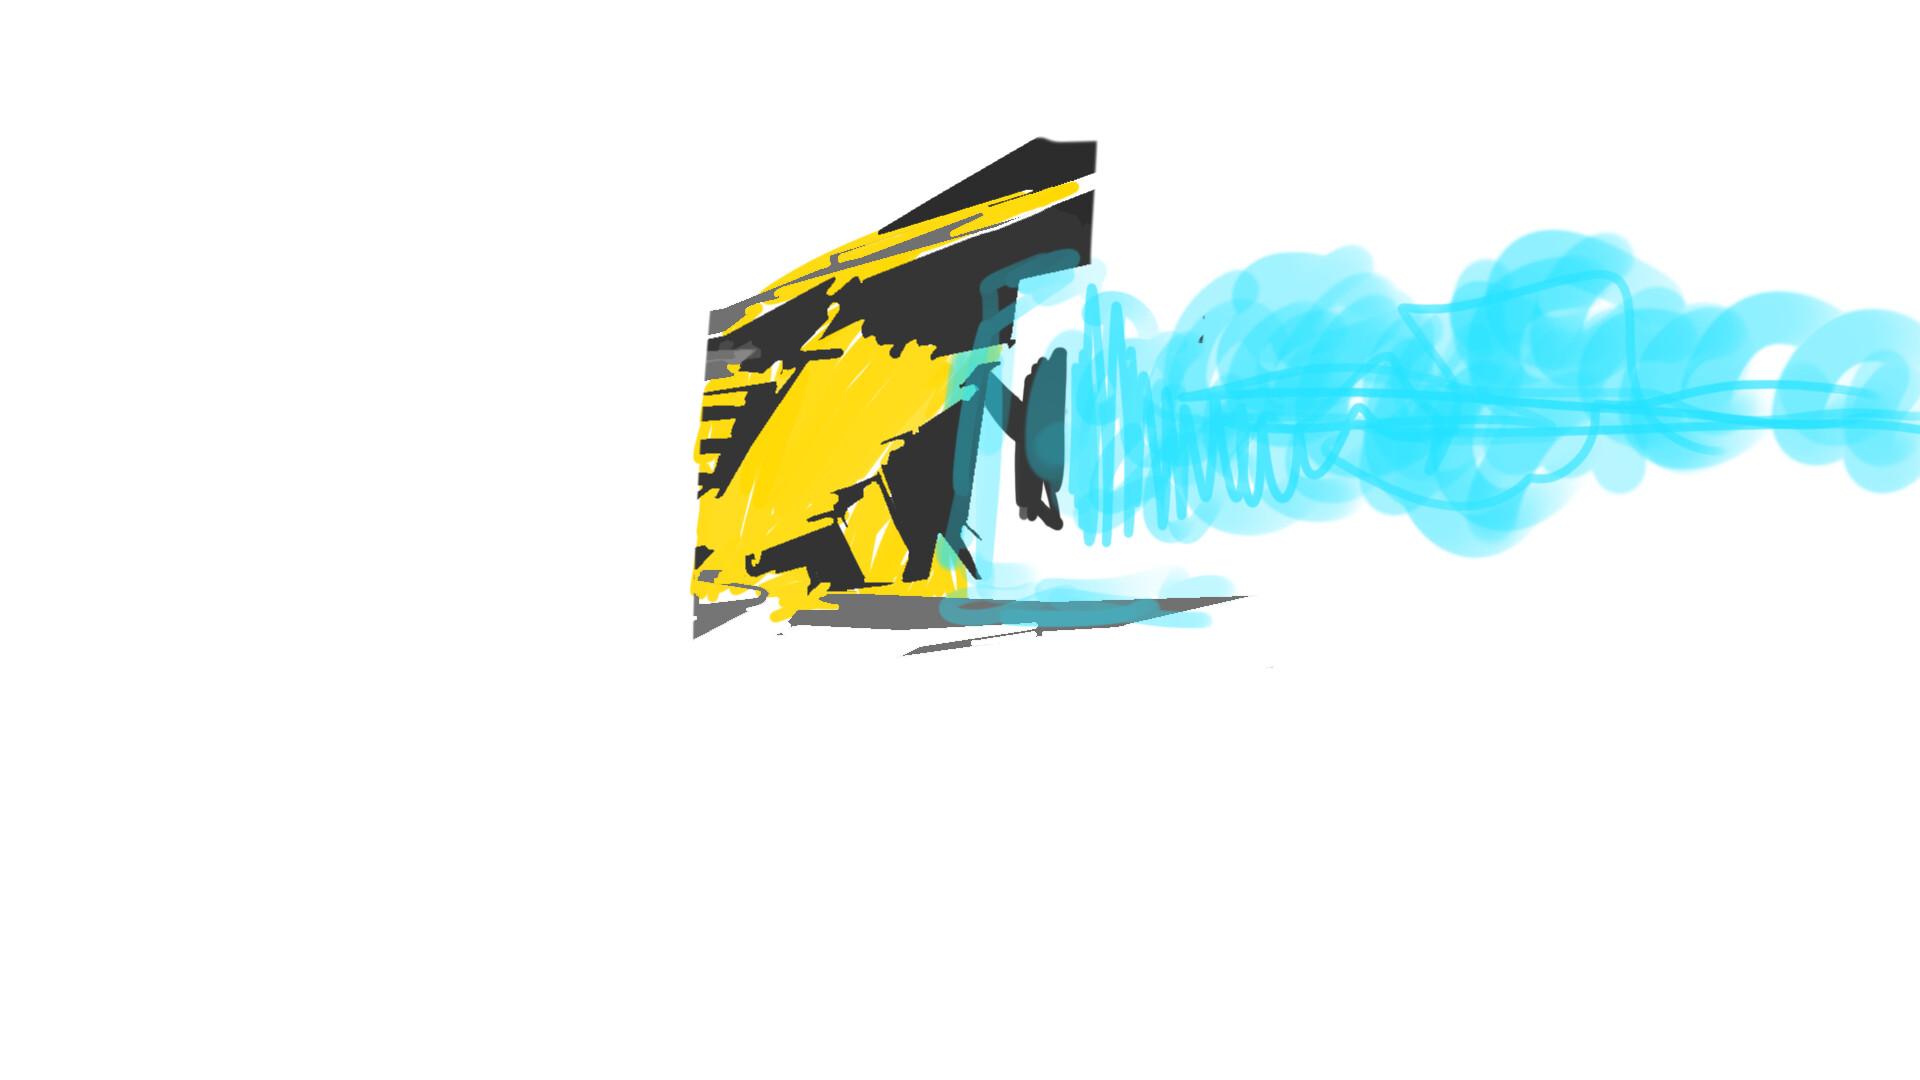 Alexander laheij ship sketch 03